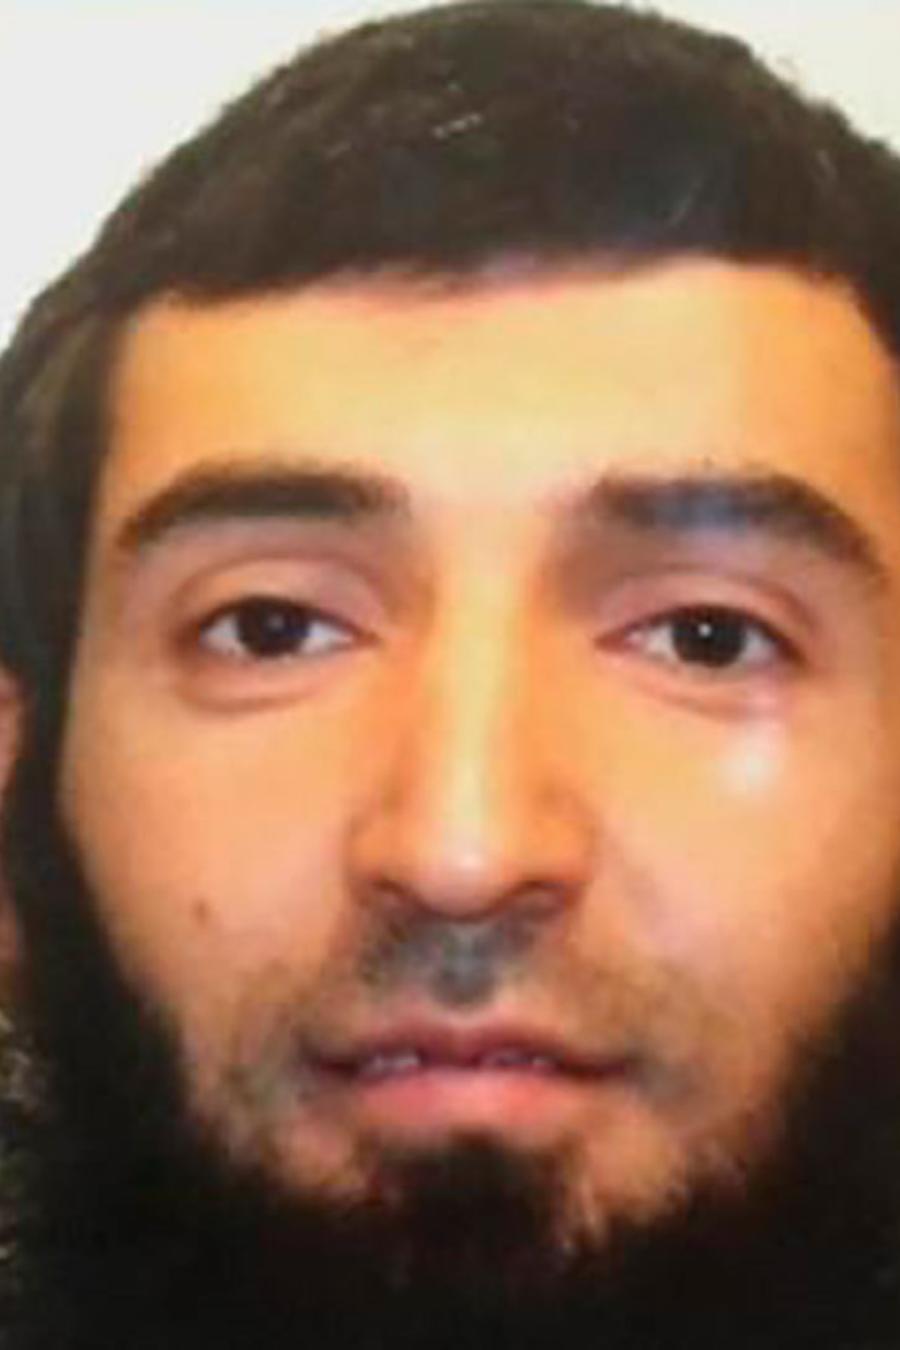 Un atacante de religión musulmana utilizó un vehículo para cometer un acto terrorista